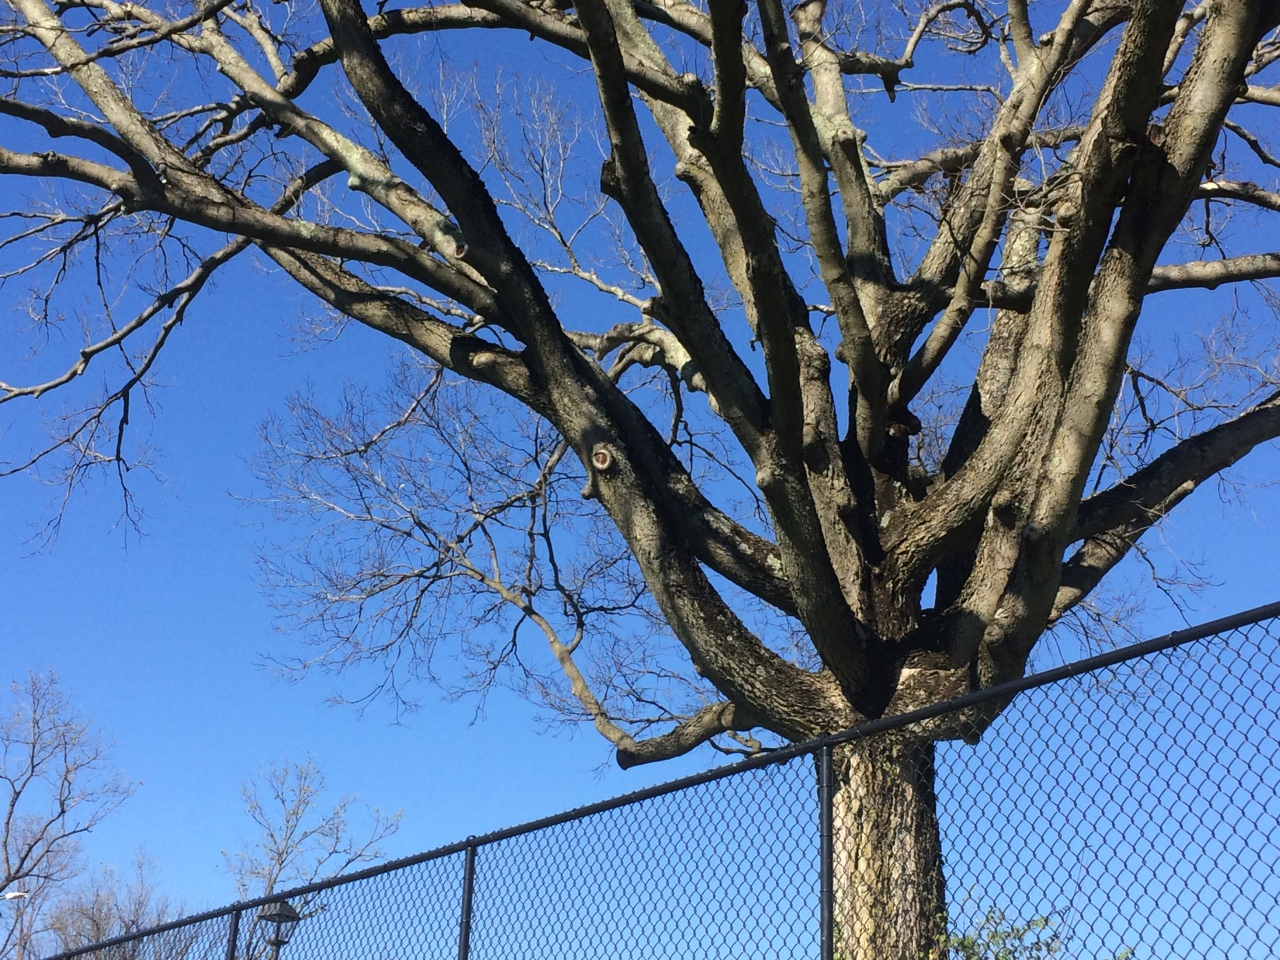 Gratitude 14 –Branches